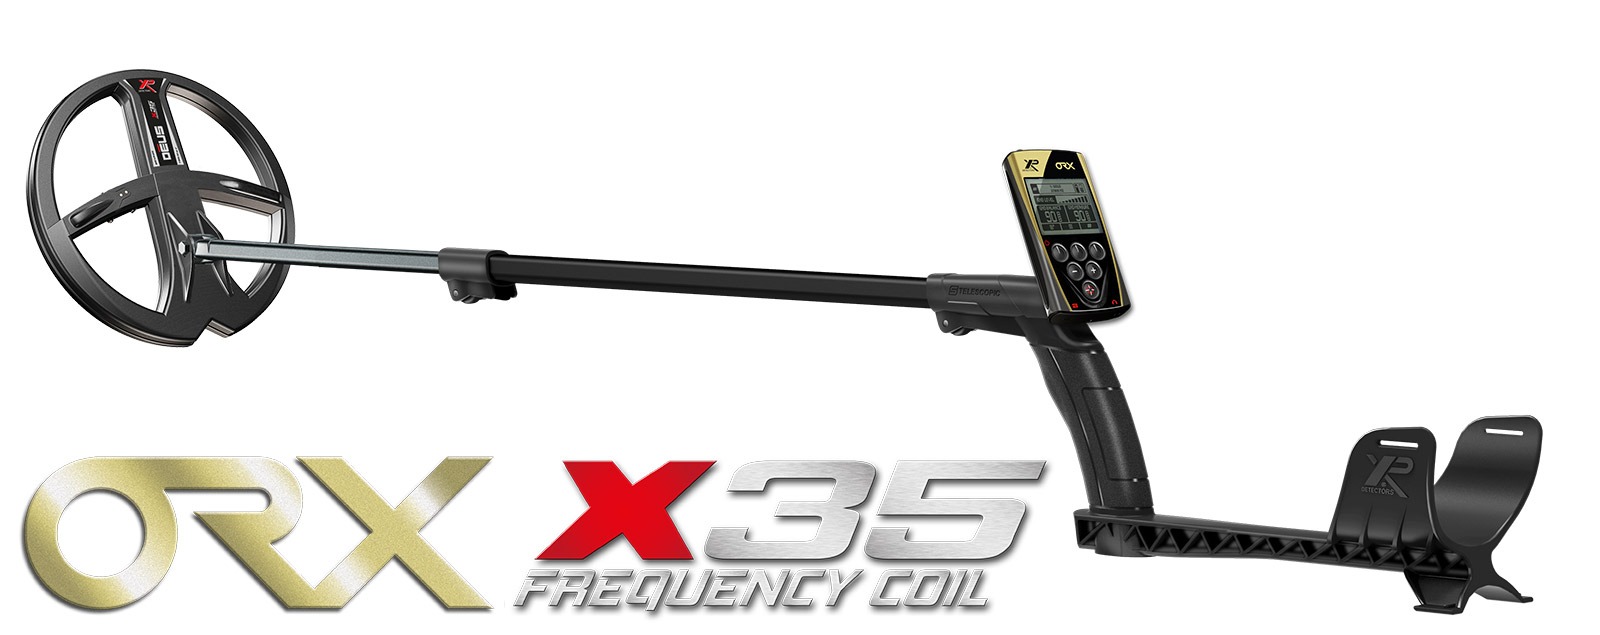 XP ORX 22 X35 - detektor kovů